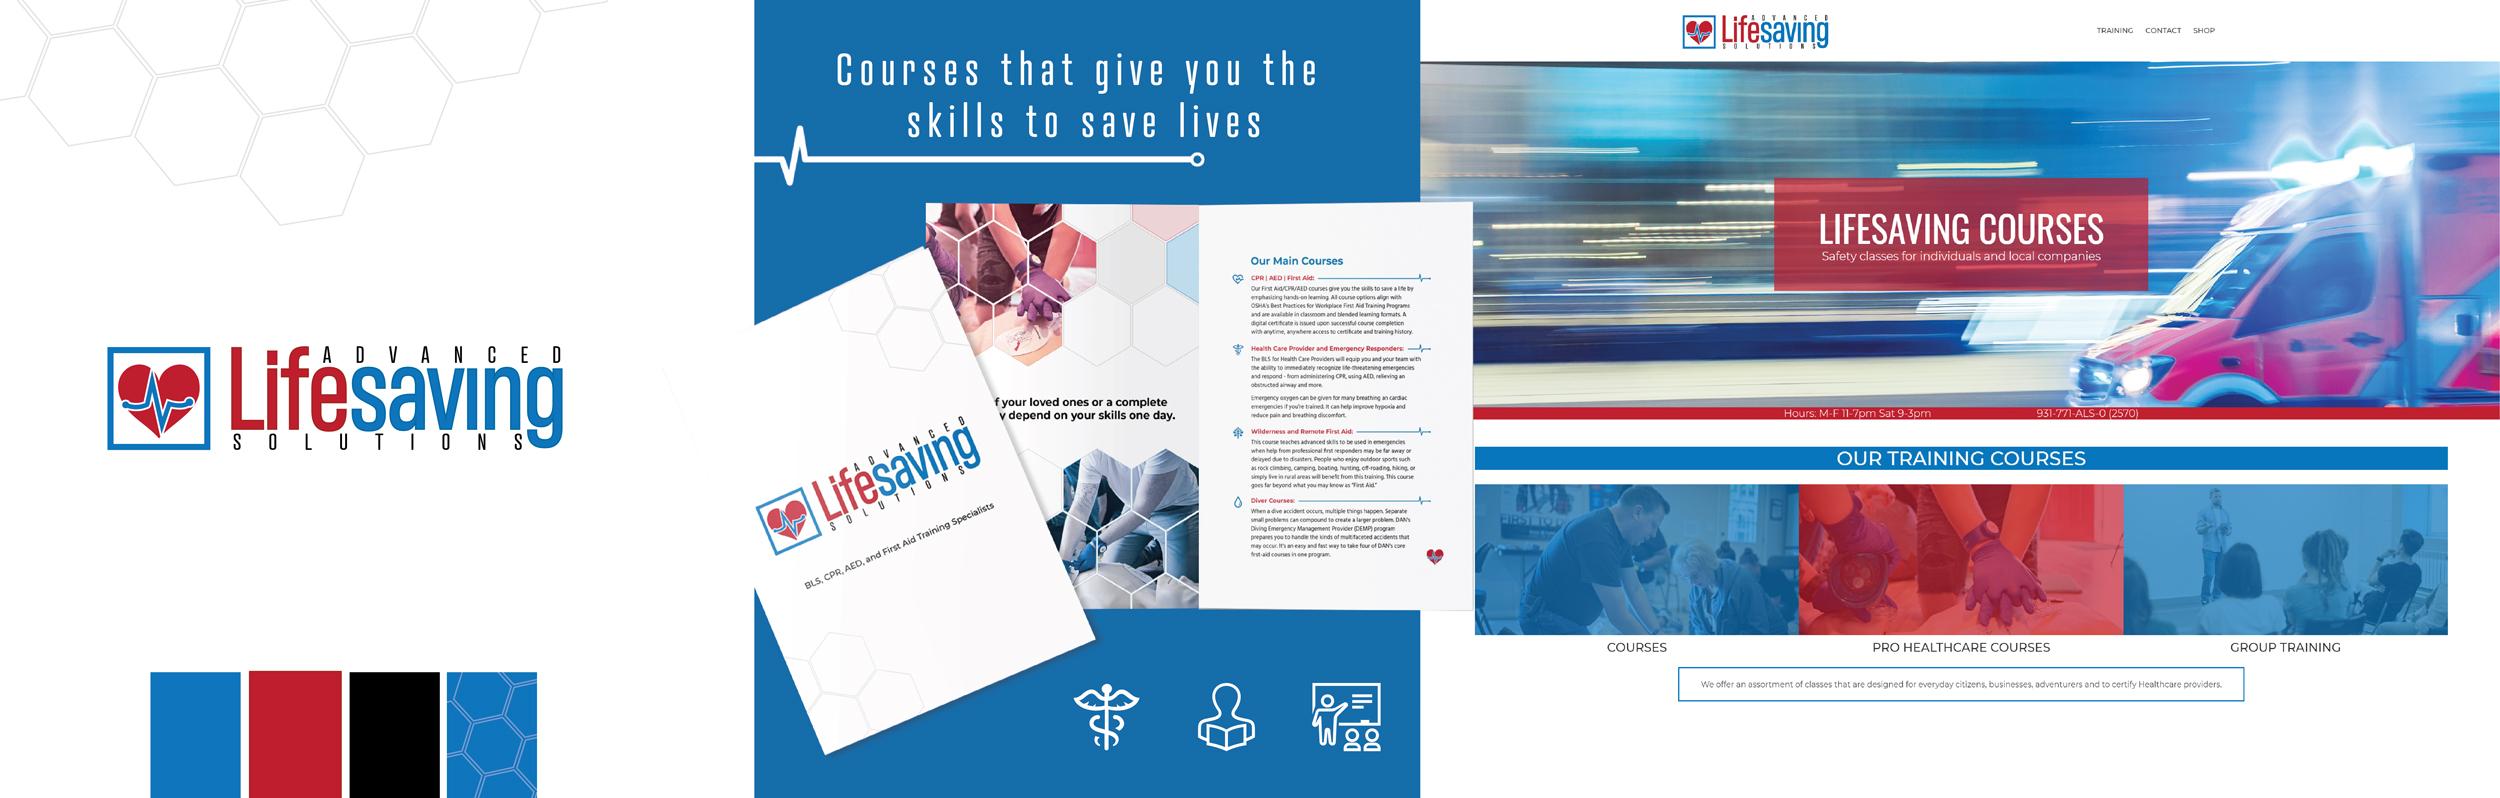 Stylescape | Advanced Lifesaving Solutions